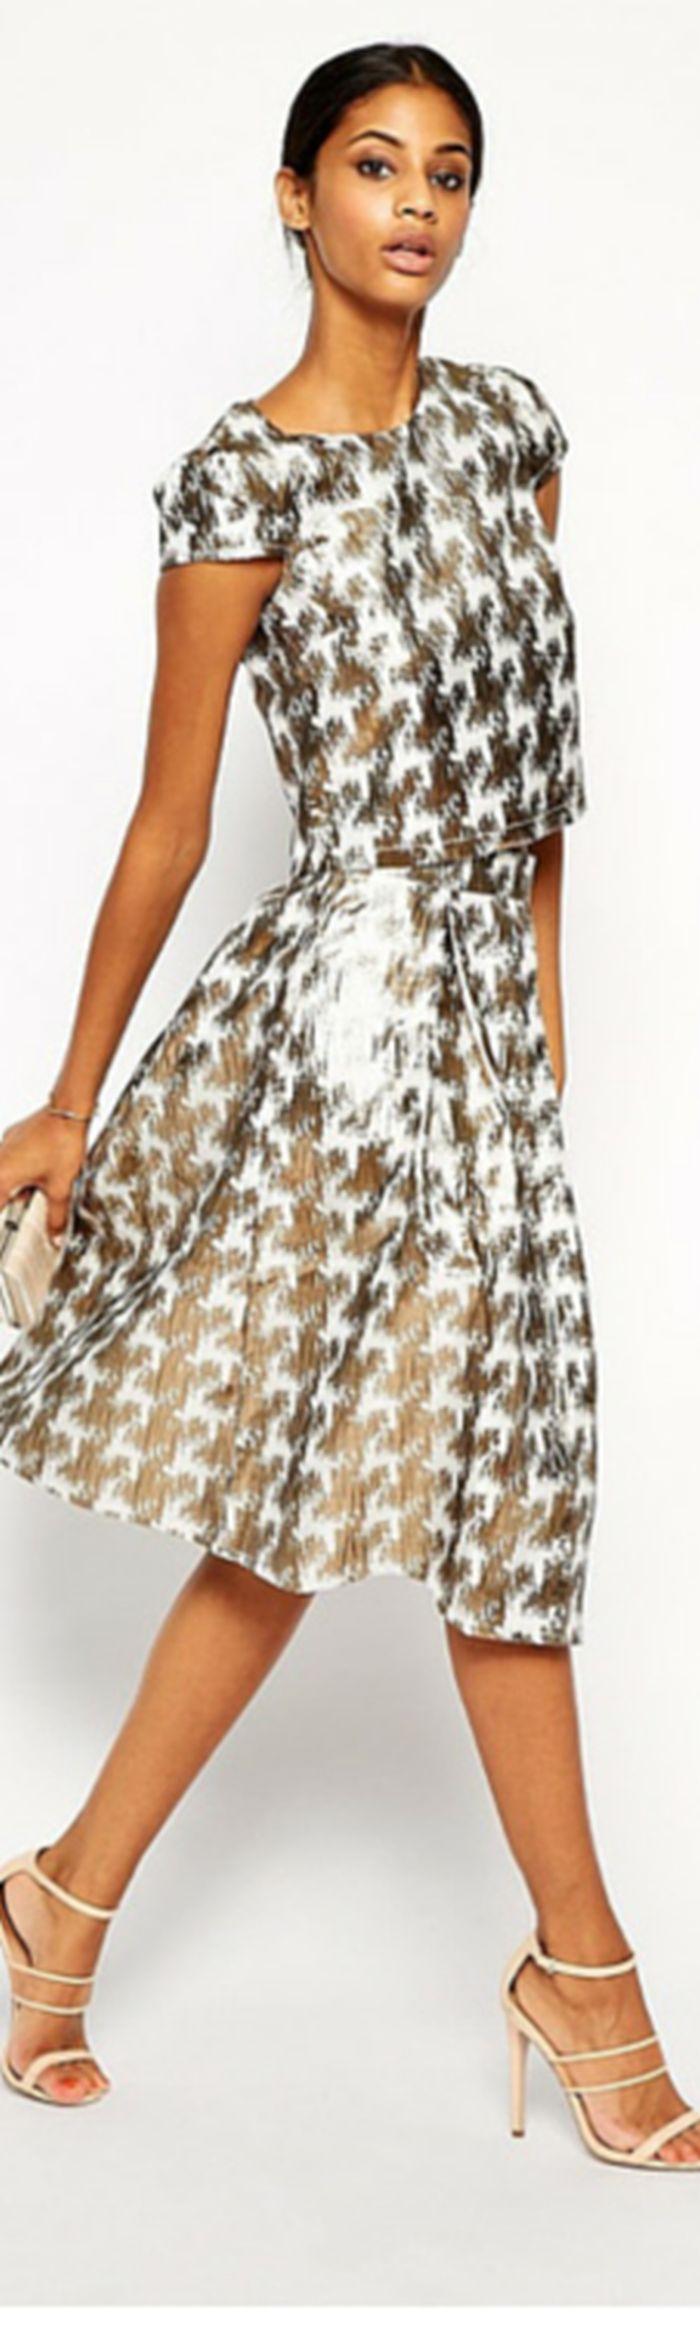 TRENDING HIGH STREET BRIDESMAID DRESSES  92530158d